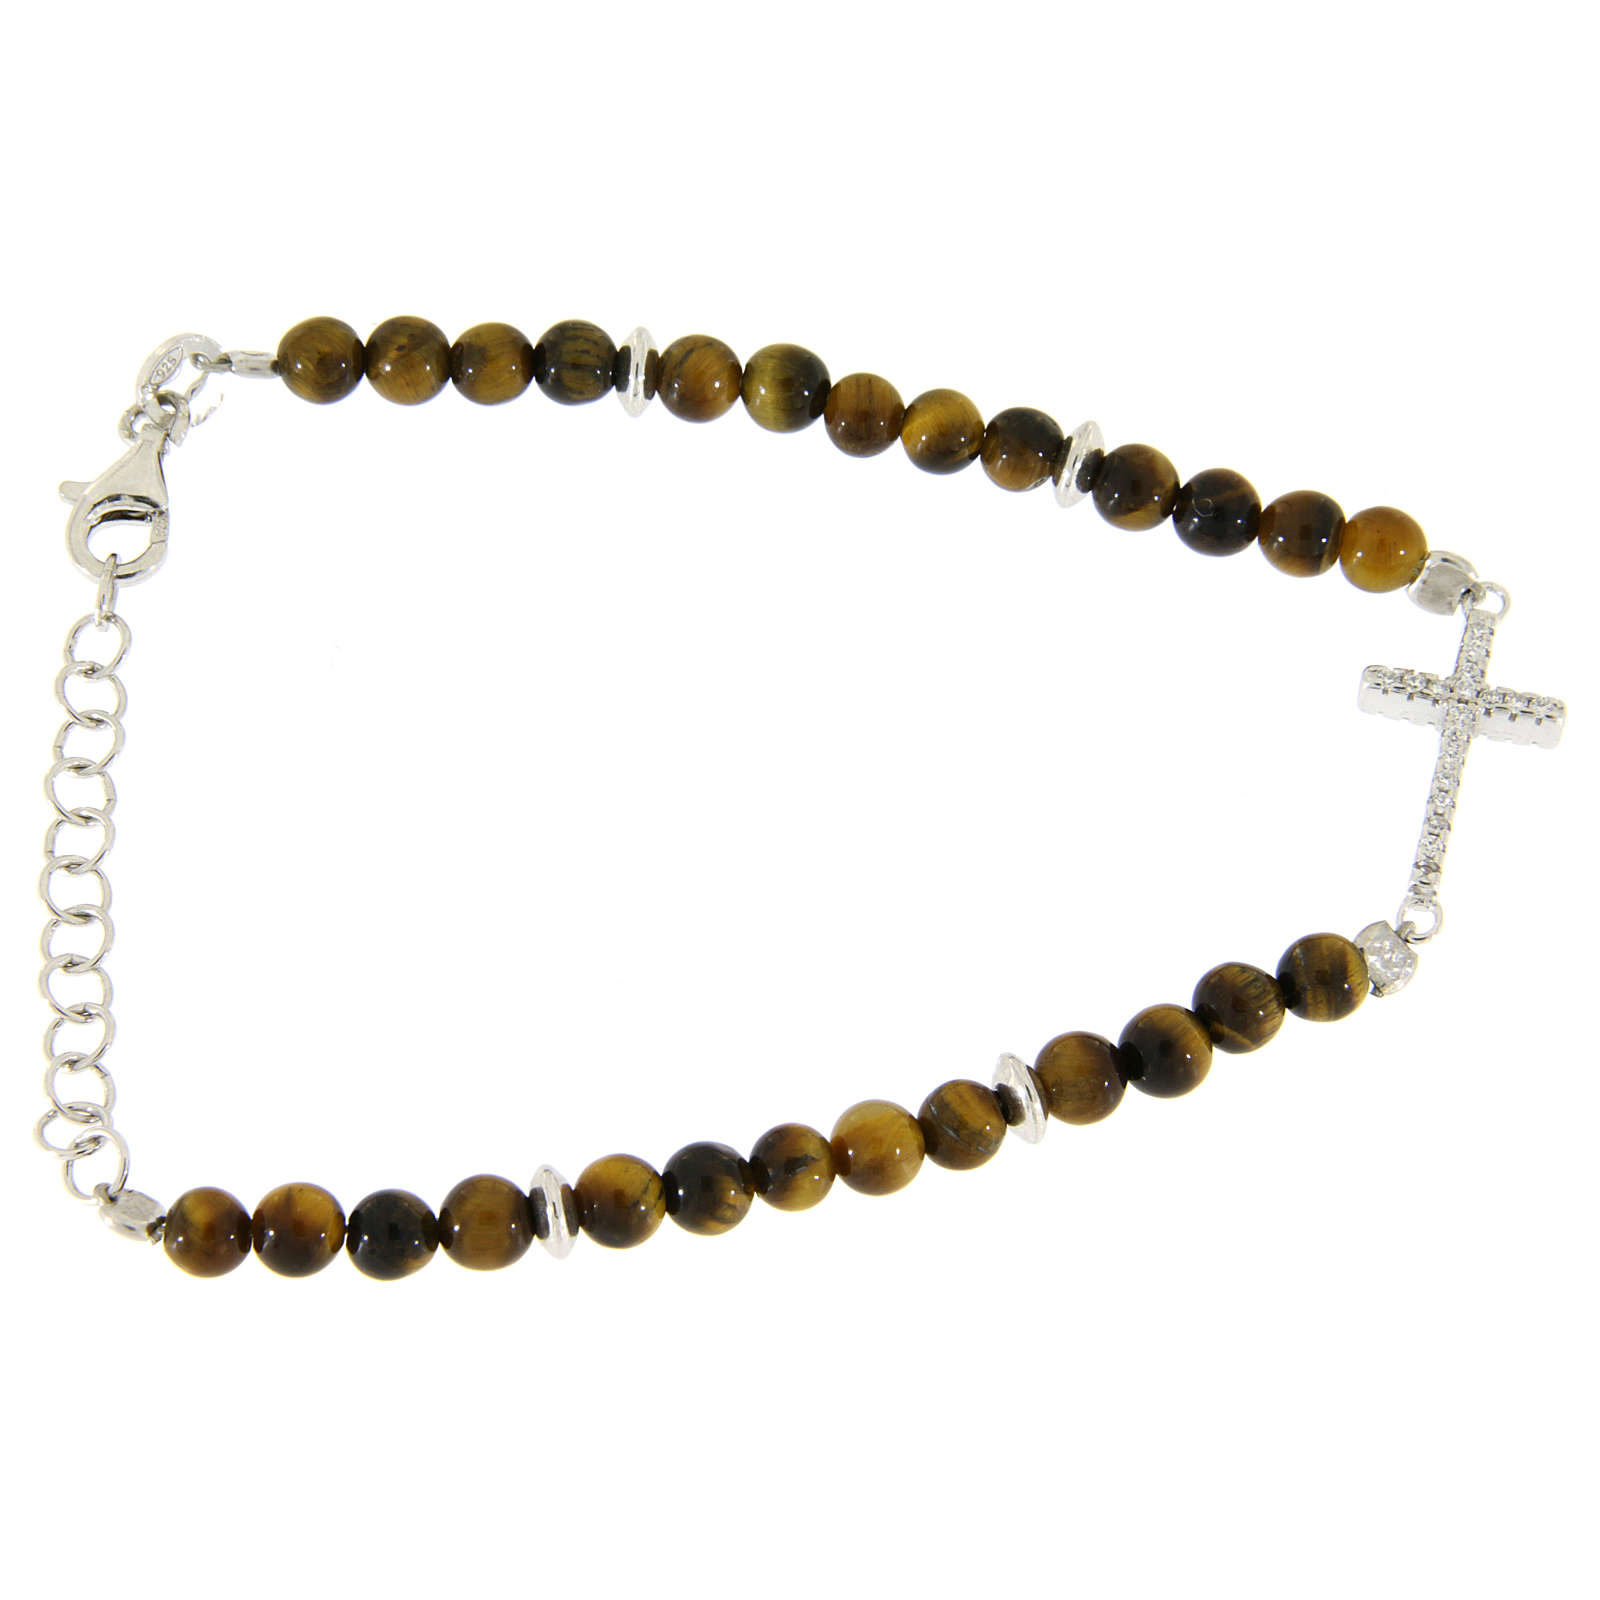 Bracelet with tiger's eye beads, white zirconate cross in 925 sterling silver 4